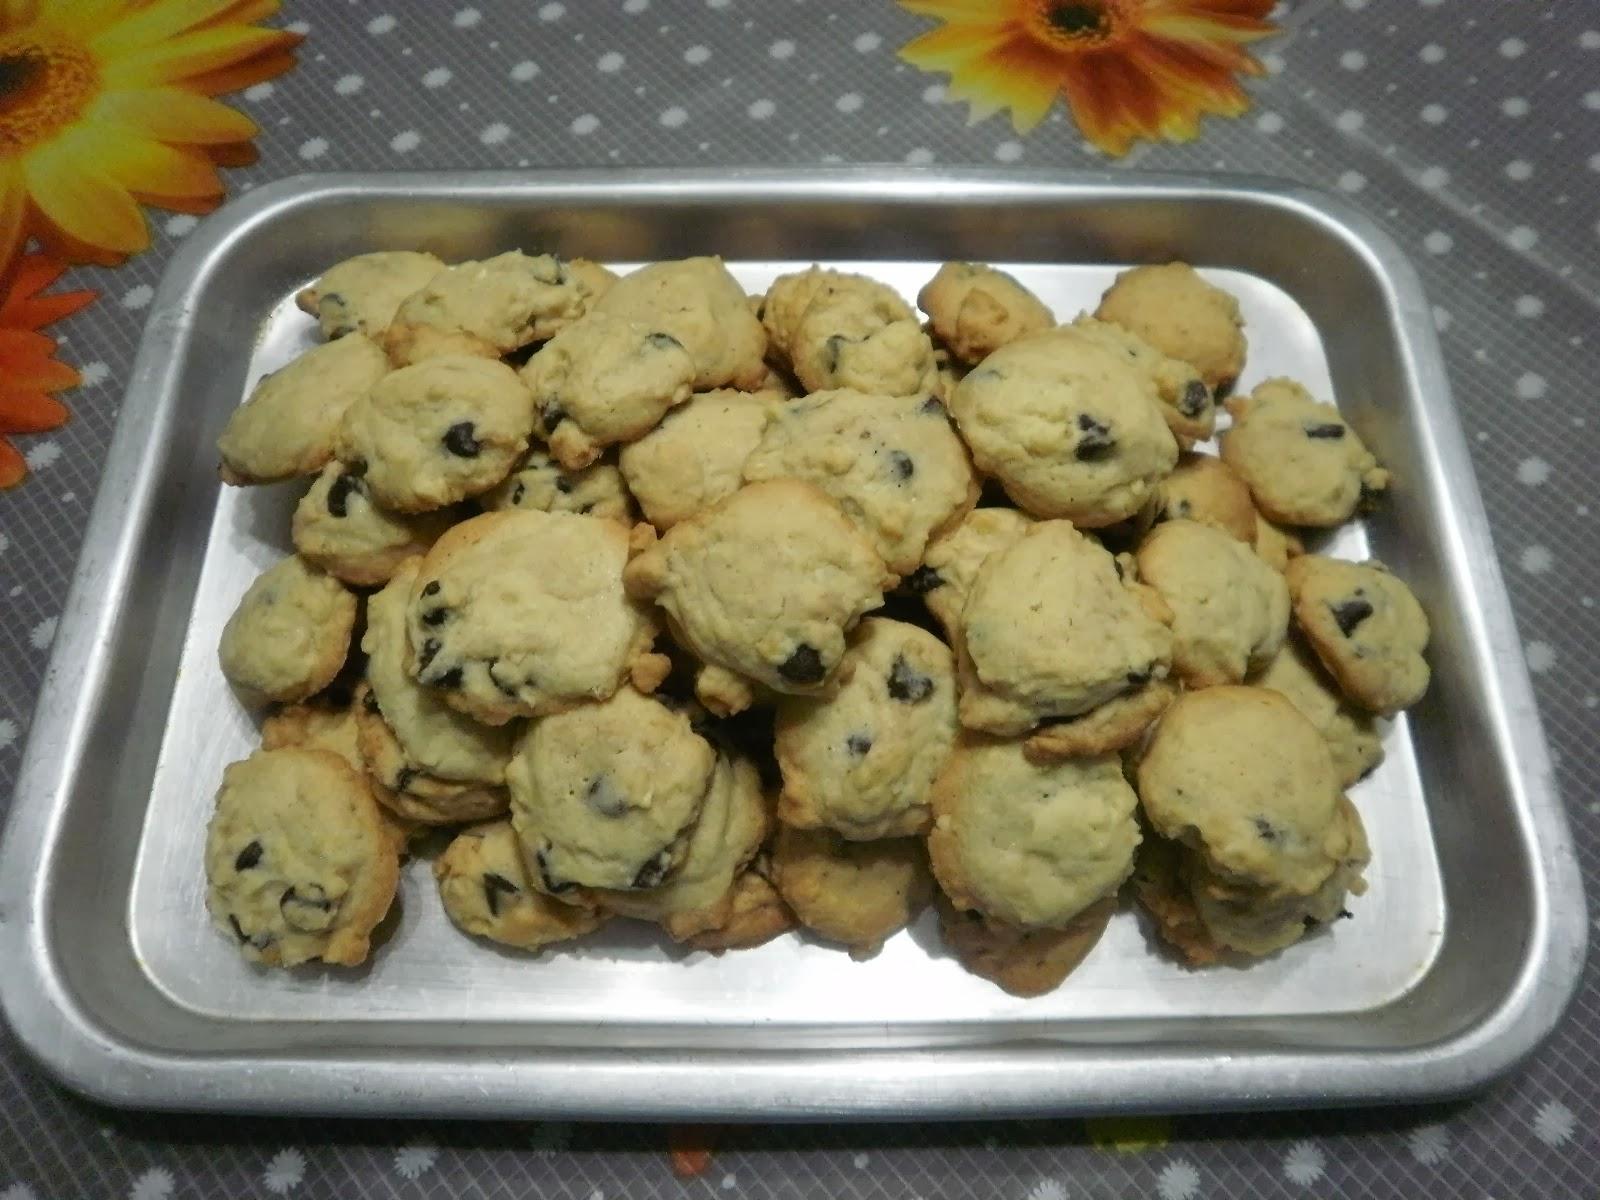 Zara ♥ Baking: CRUNCHY CHOCOLATE CHIP COOKIES